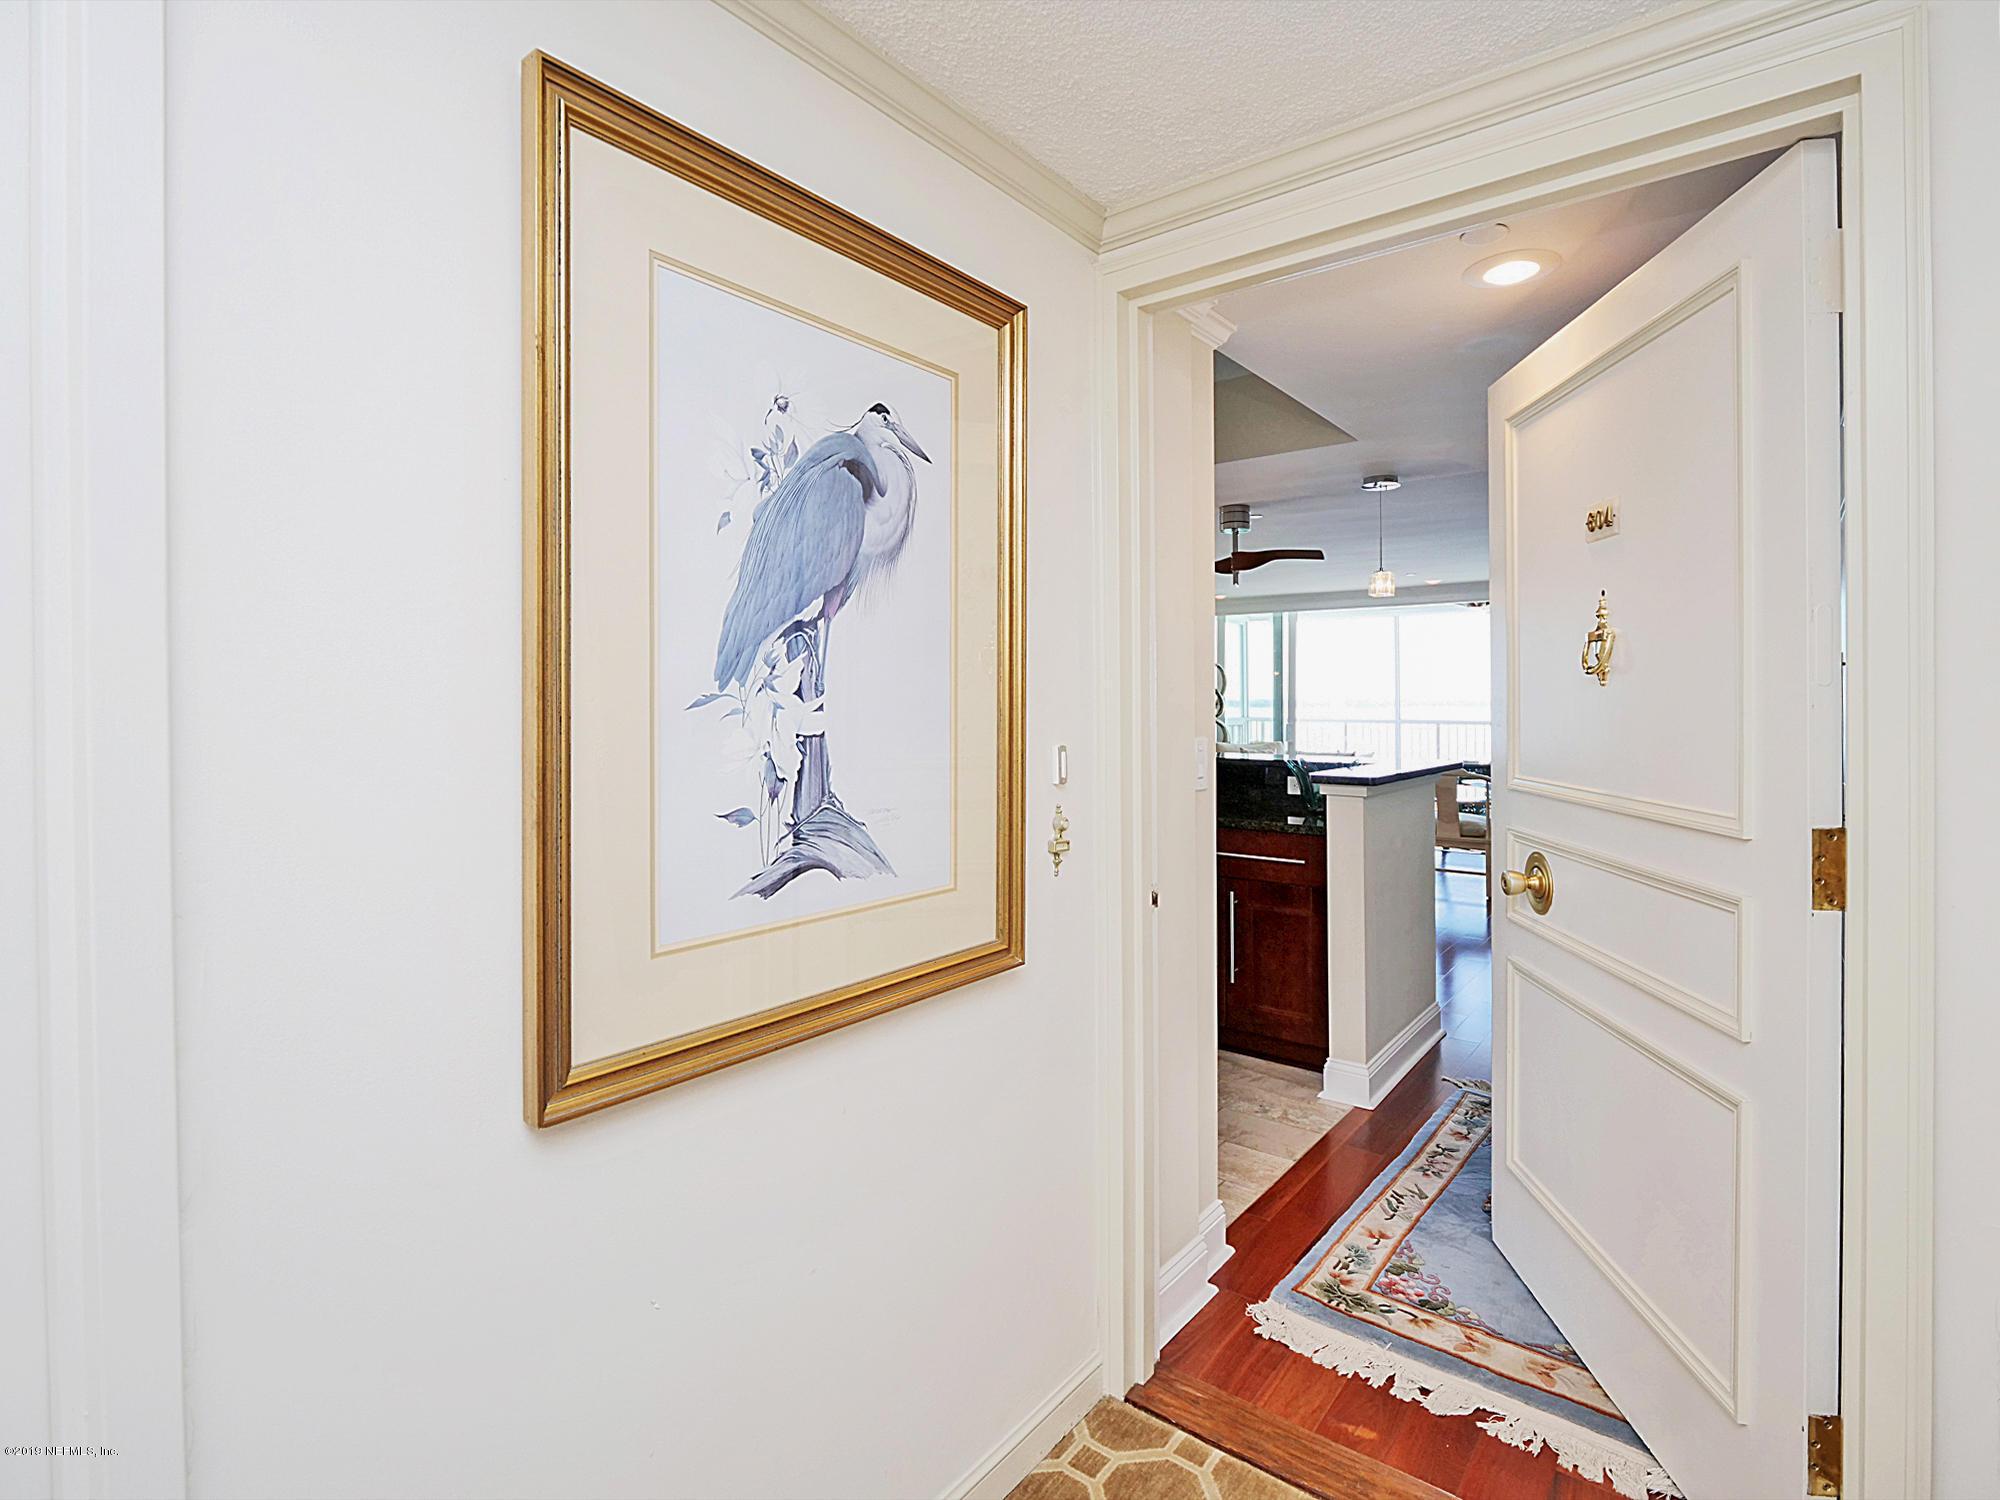 1560 LANCASTER, JACKSONVILLE, FLORIDA 32204, 2 Bedrooms Bedrooms, ,2 BathroomsBathrooms,Residential,For sale,LANCASTER,1062486